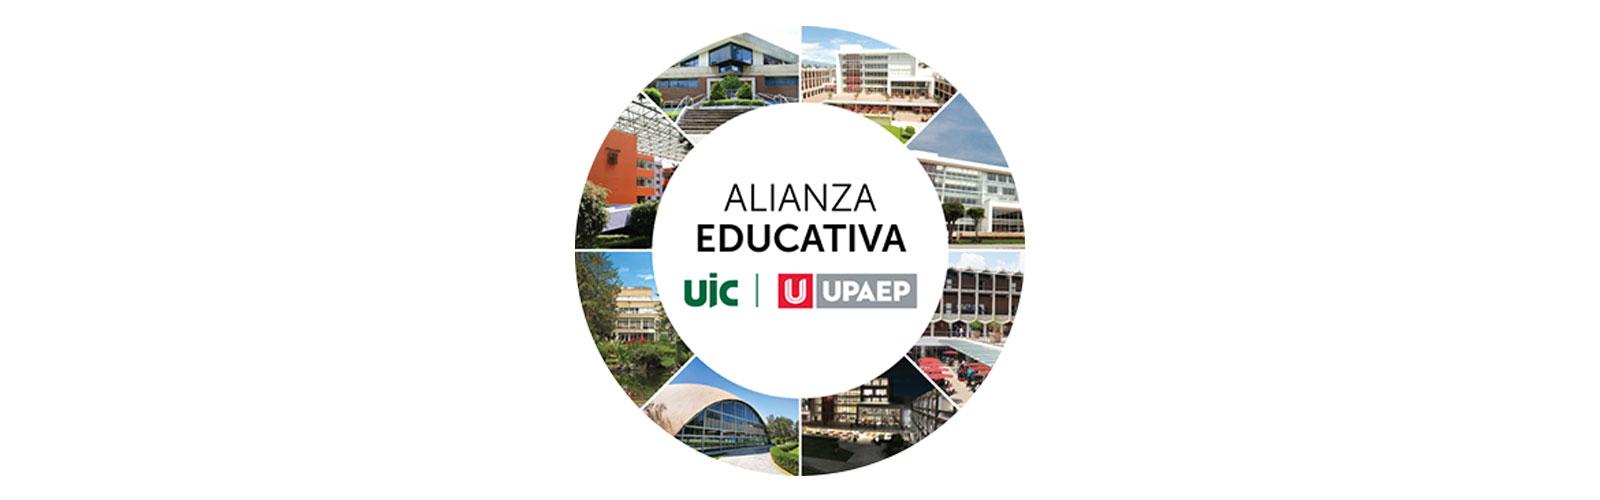 Alianza UIC UPAEP